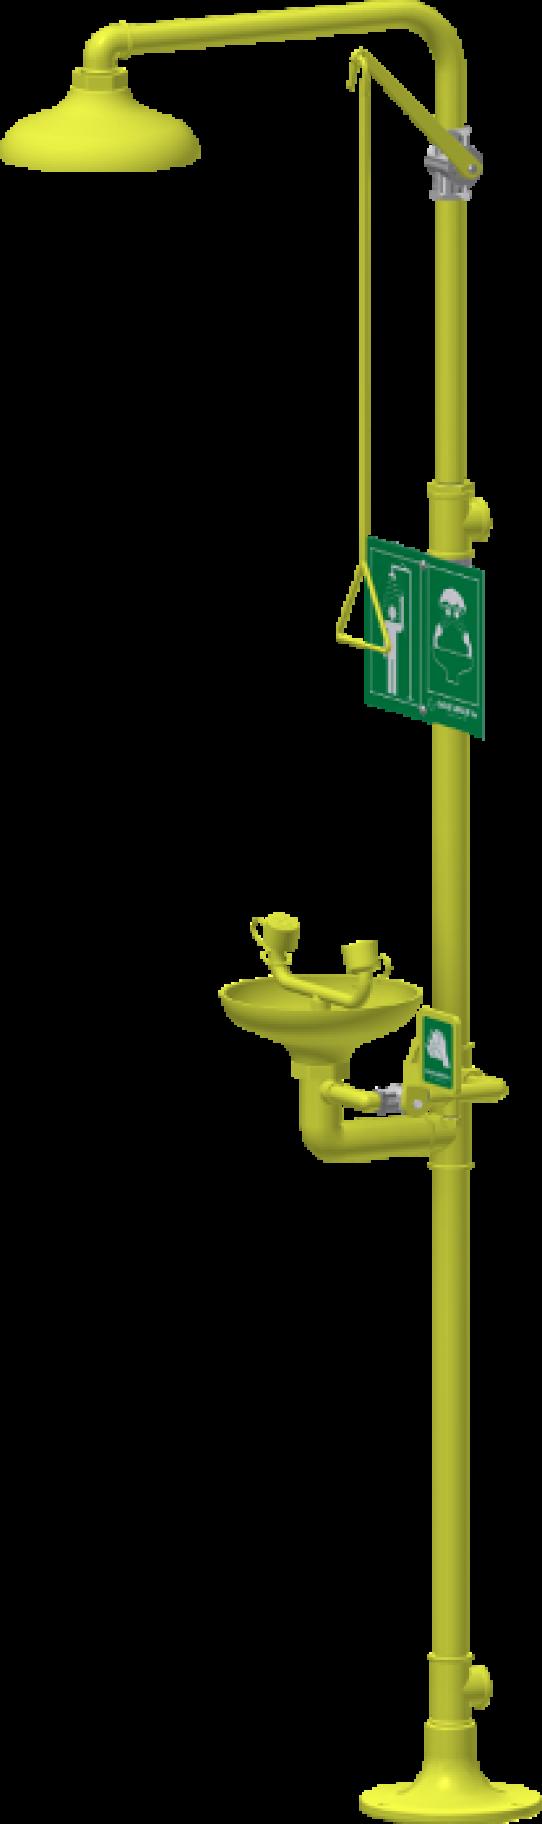 Low ceiling pedestal Shower and Eyewash, ABS shower head / bowl